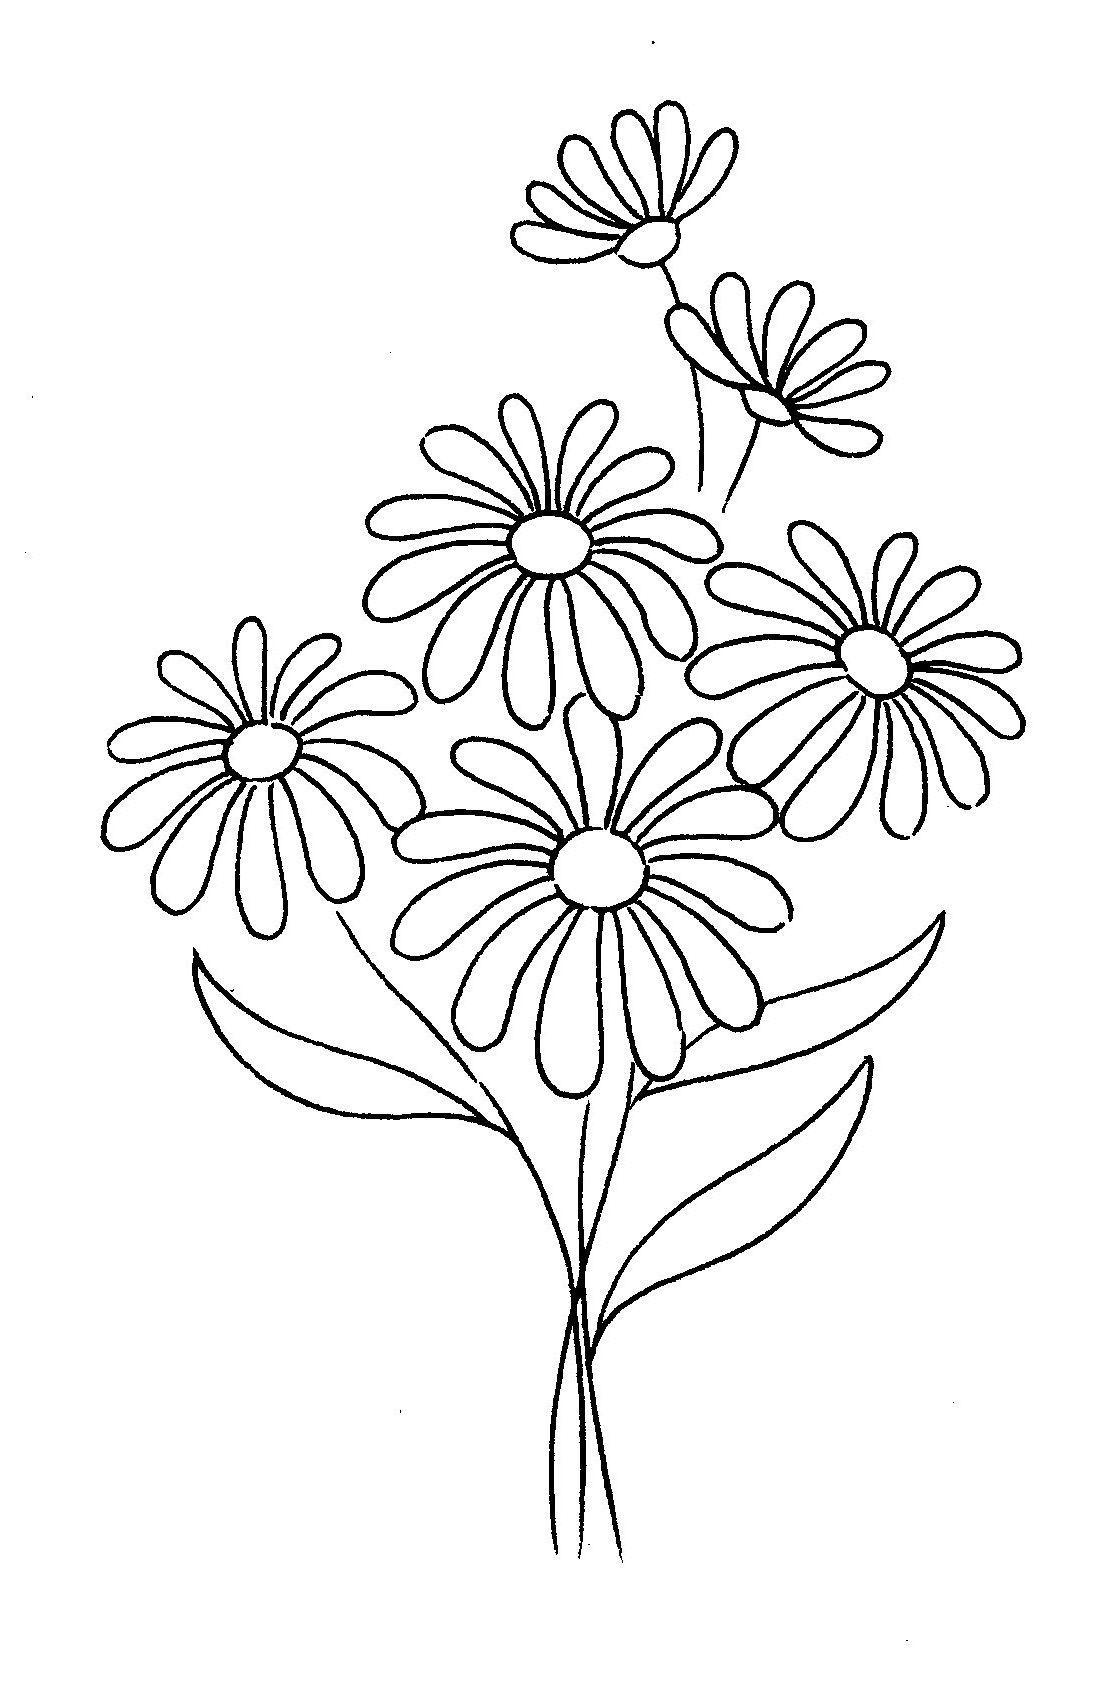 Tumblr Flower Drawing Daisy Daisies drawing tumblr daisy